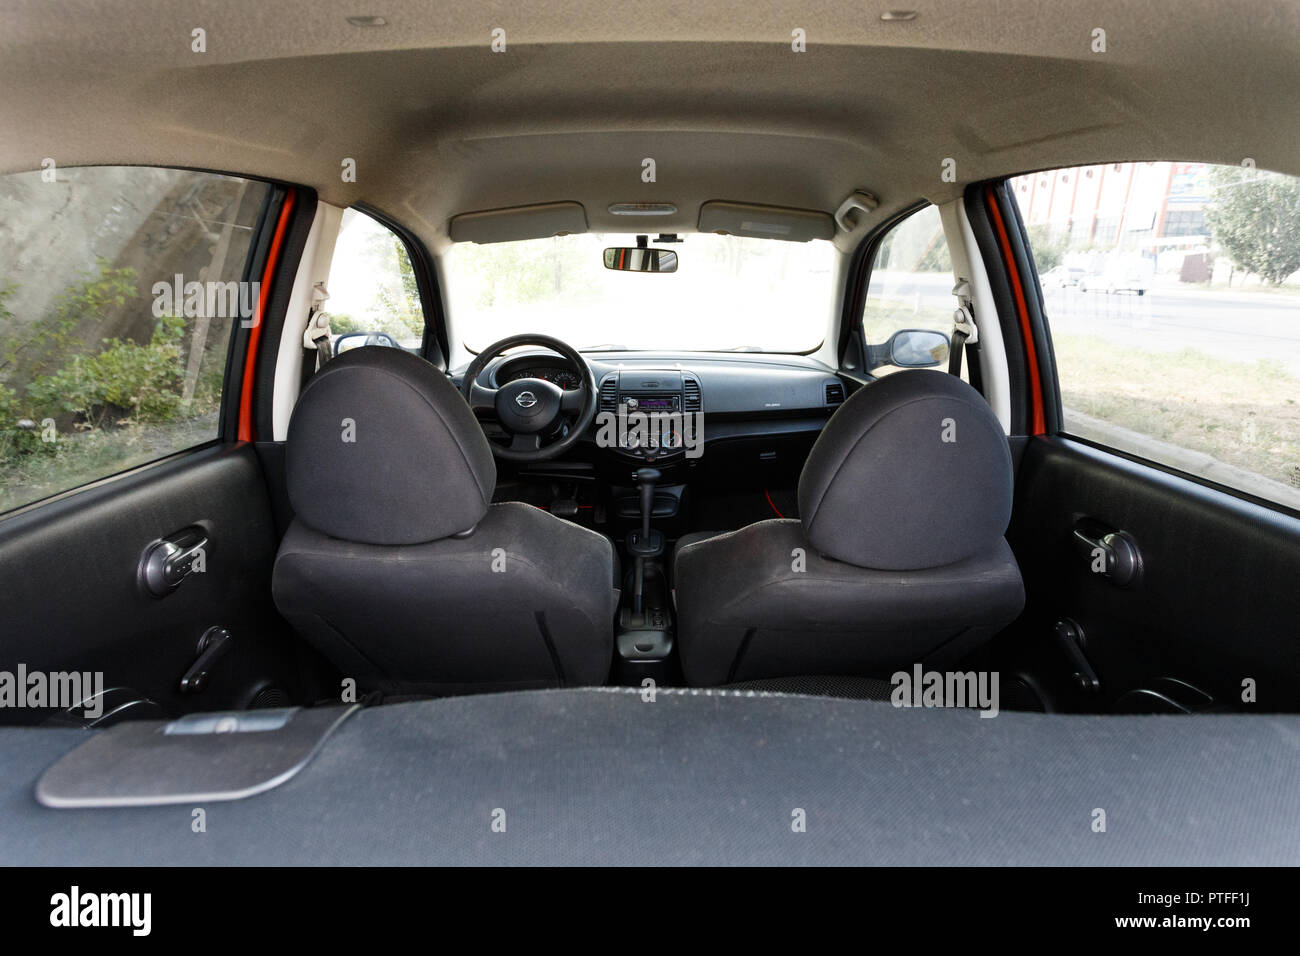 Dnipro Ukraine August 10 2016 Nissan Micra Interior Stock Photo Alamy